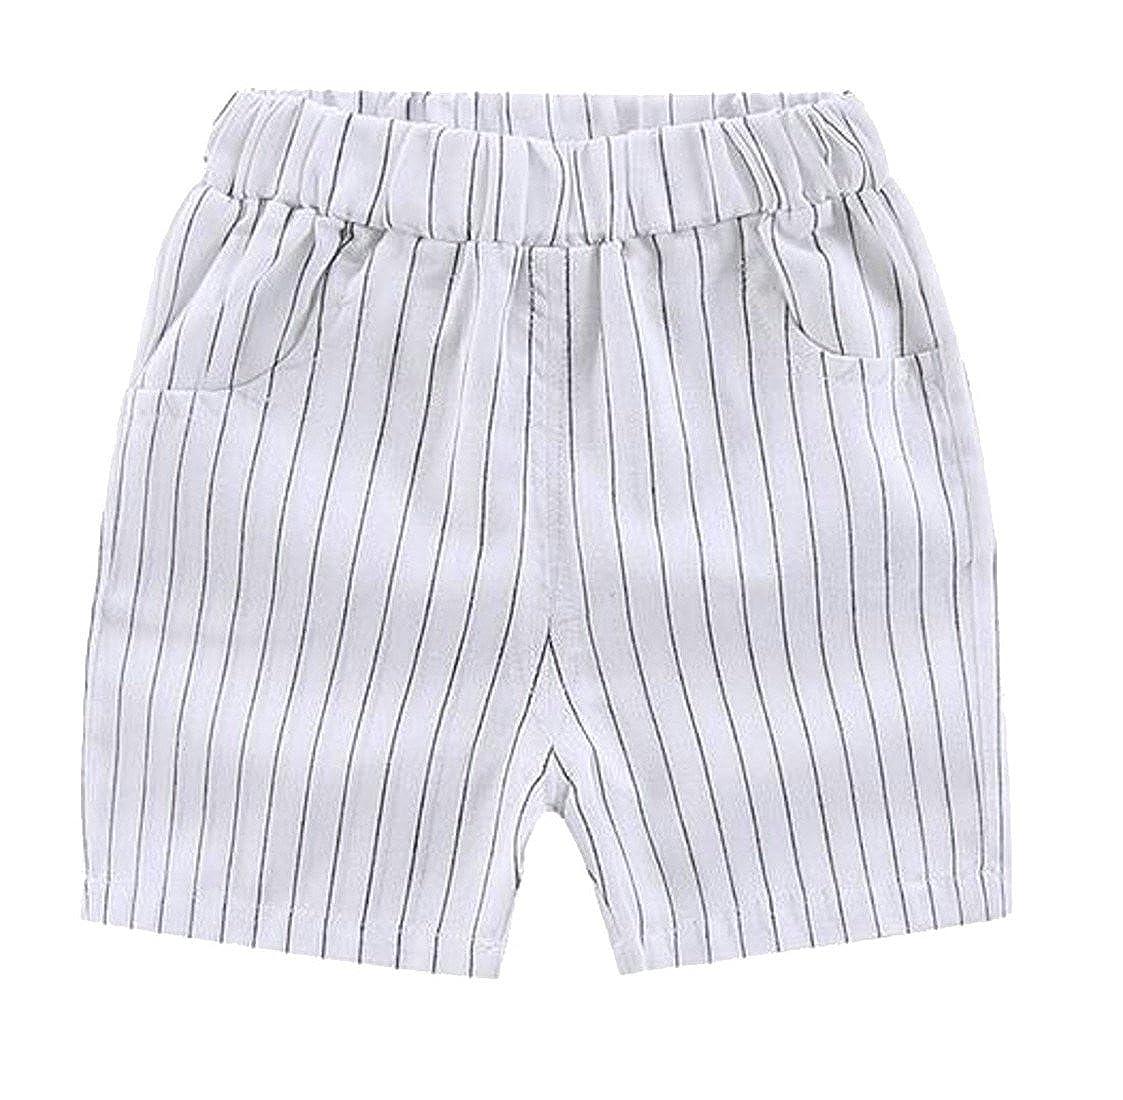 Wopop Toddler Boy Printed Pull On Summer Stripe Stylish Linen Swim Trunks Shorts